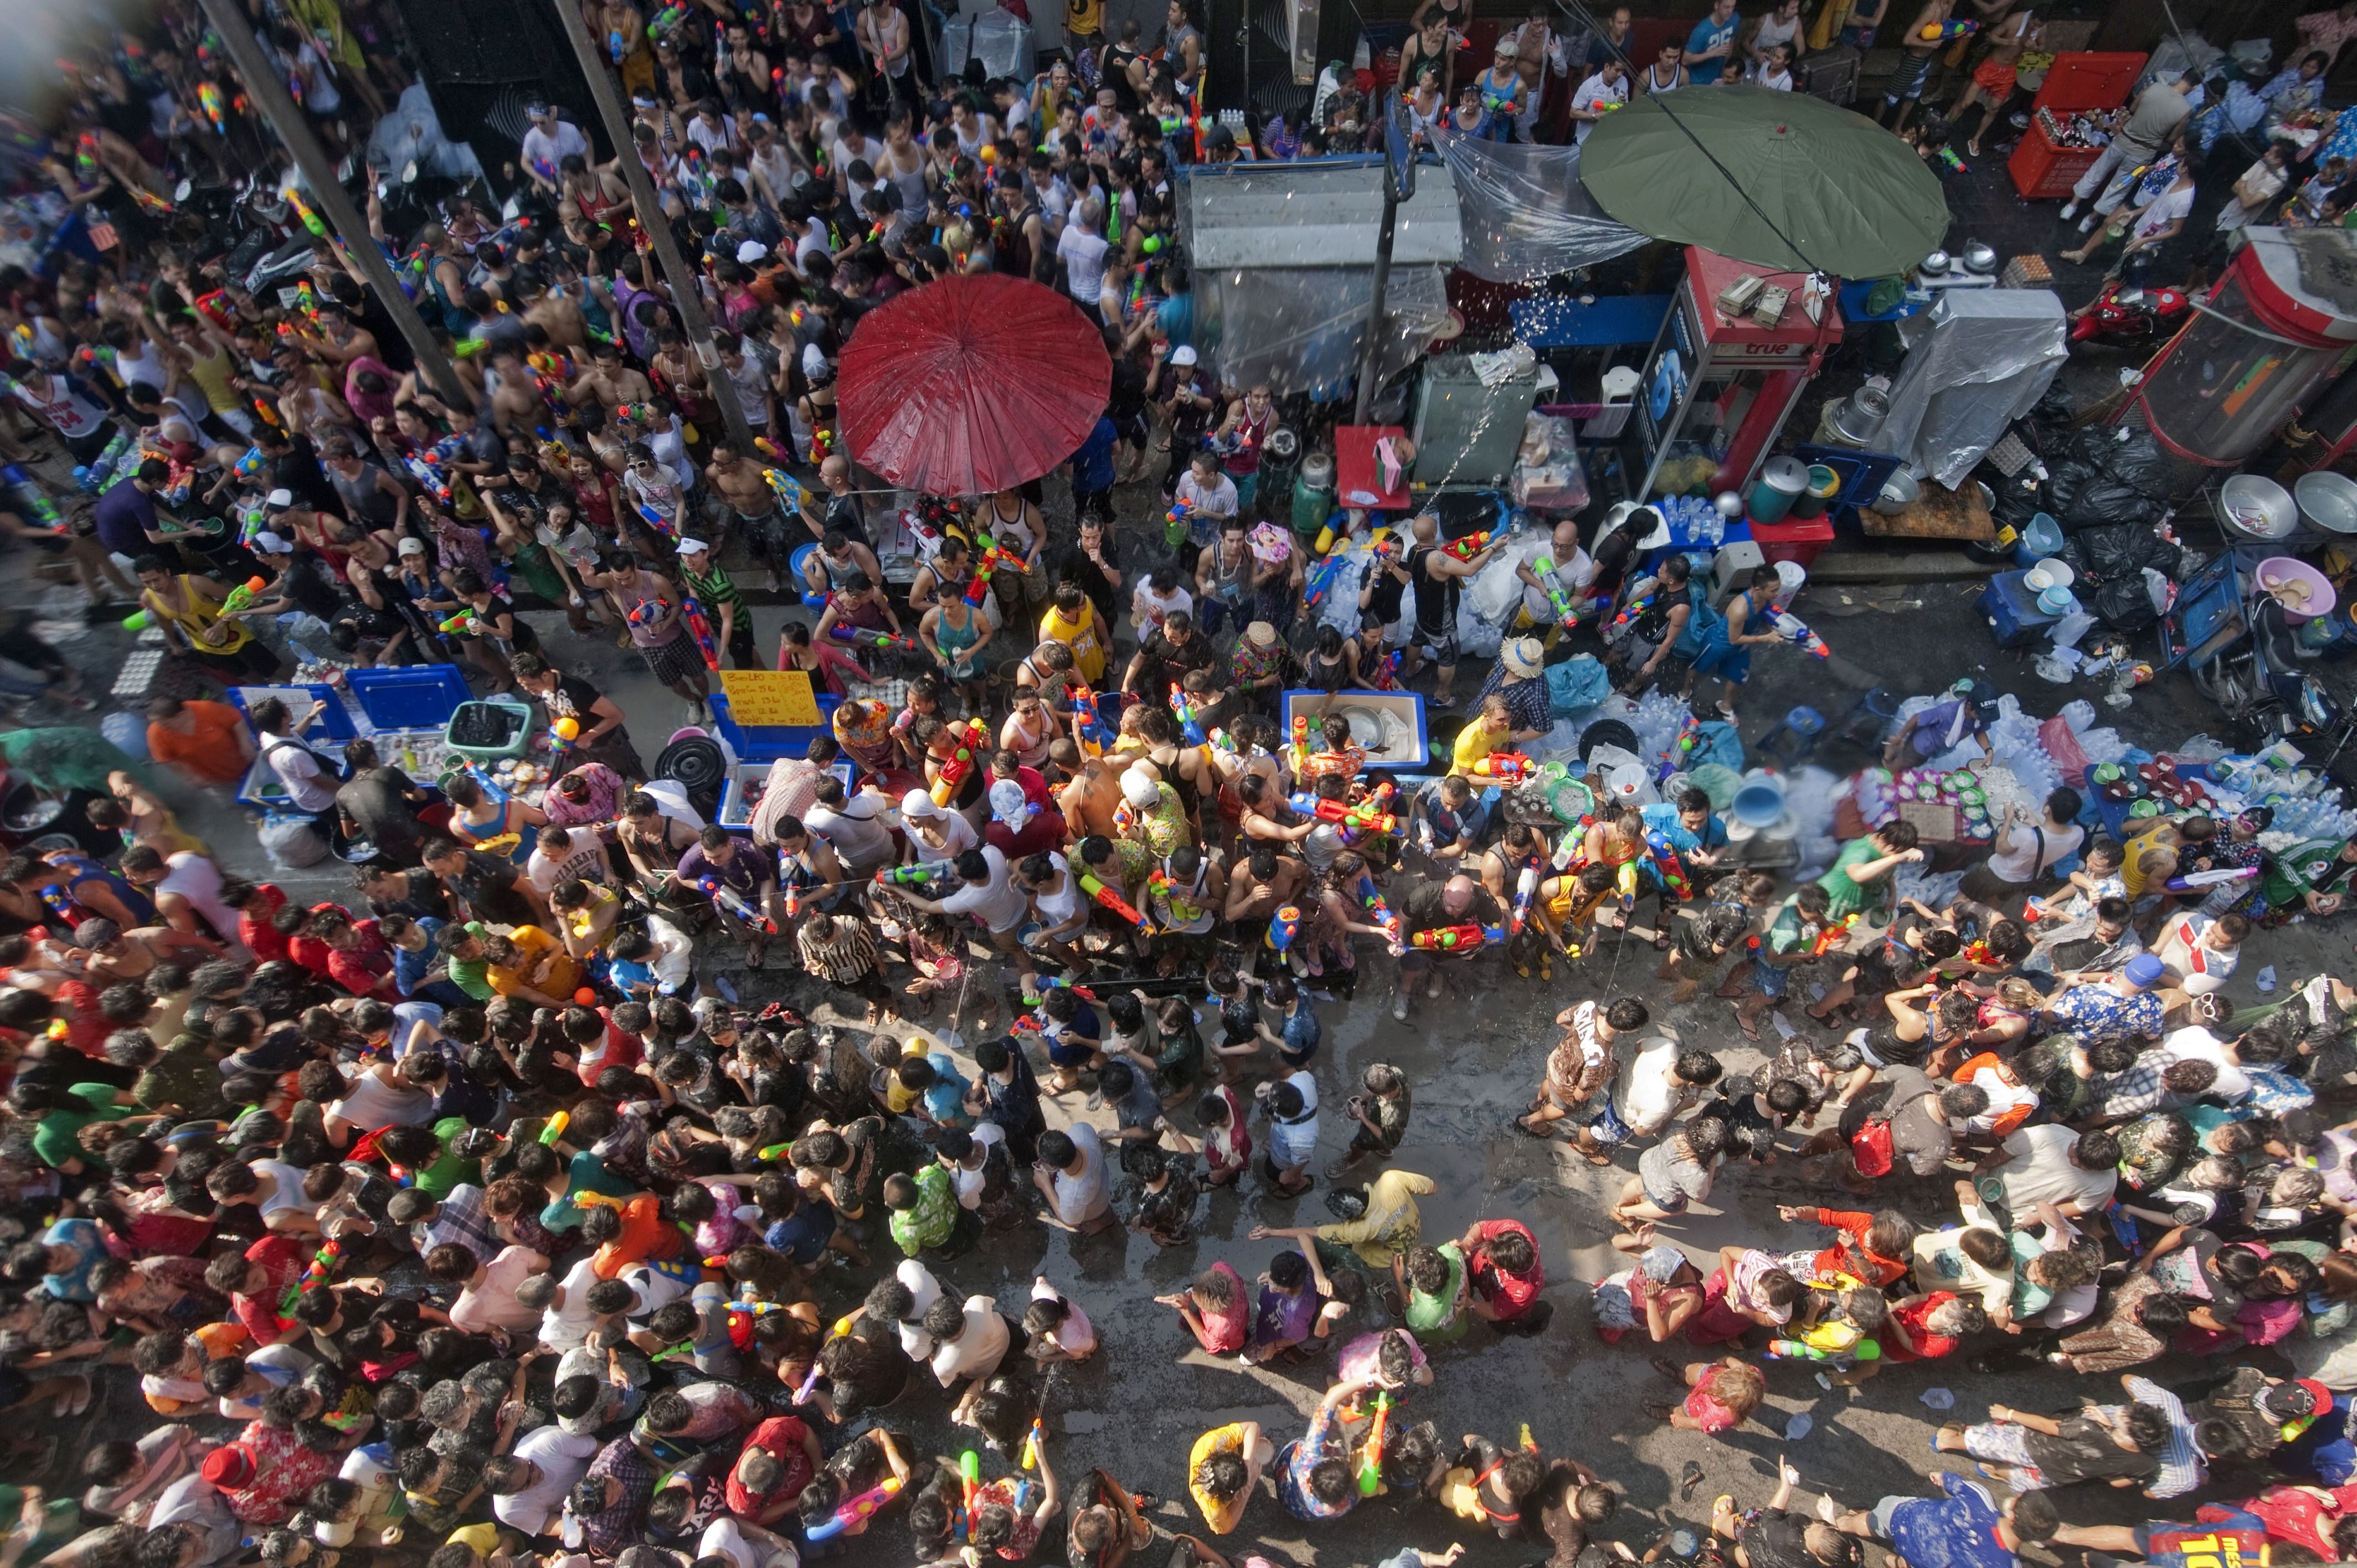 Songkran: The Thailand Water Festival